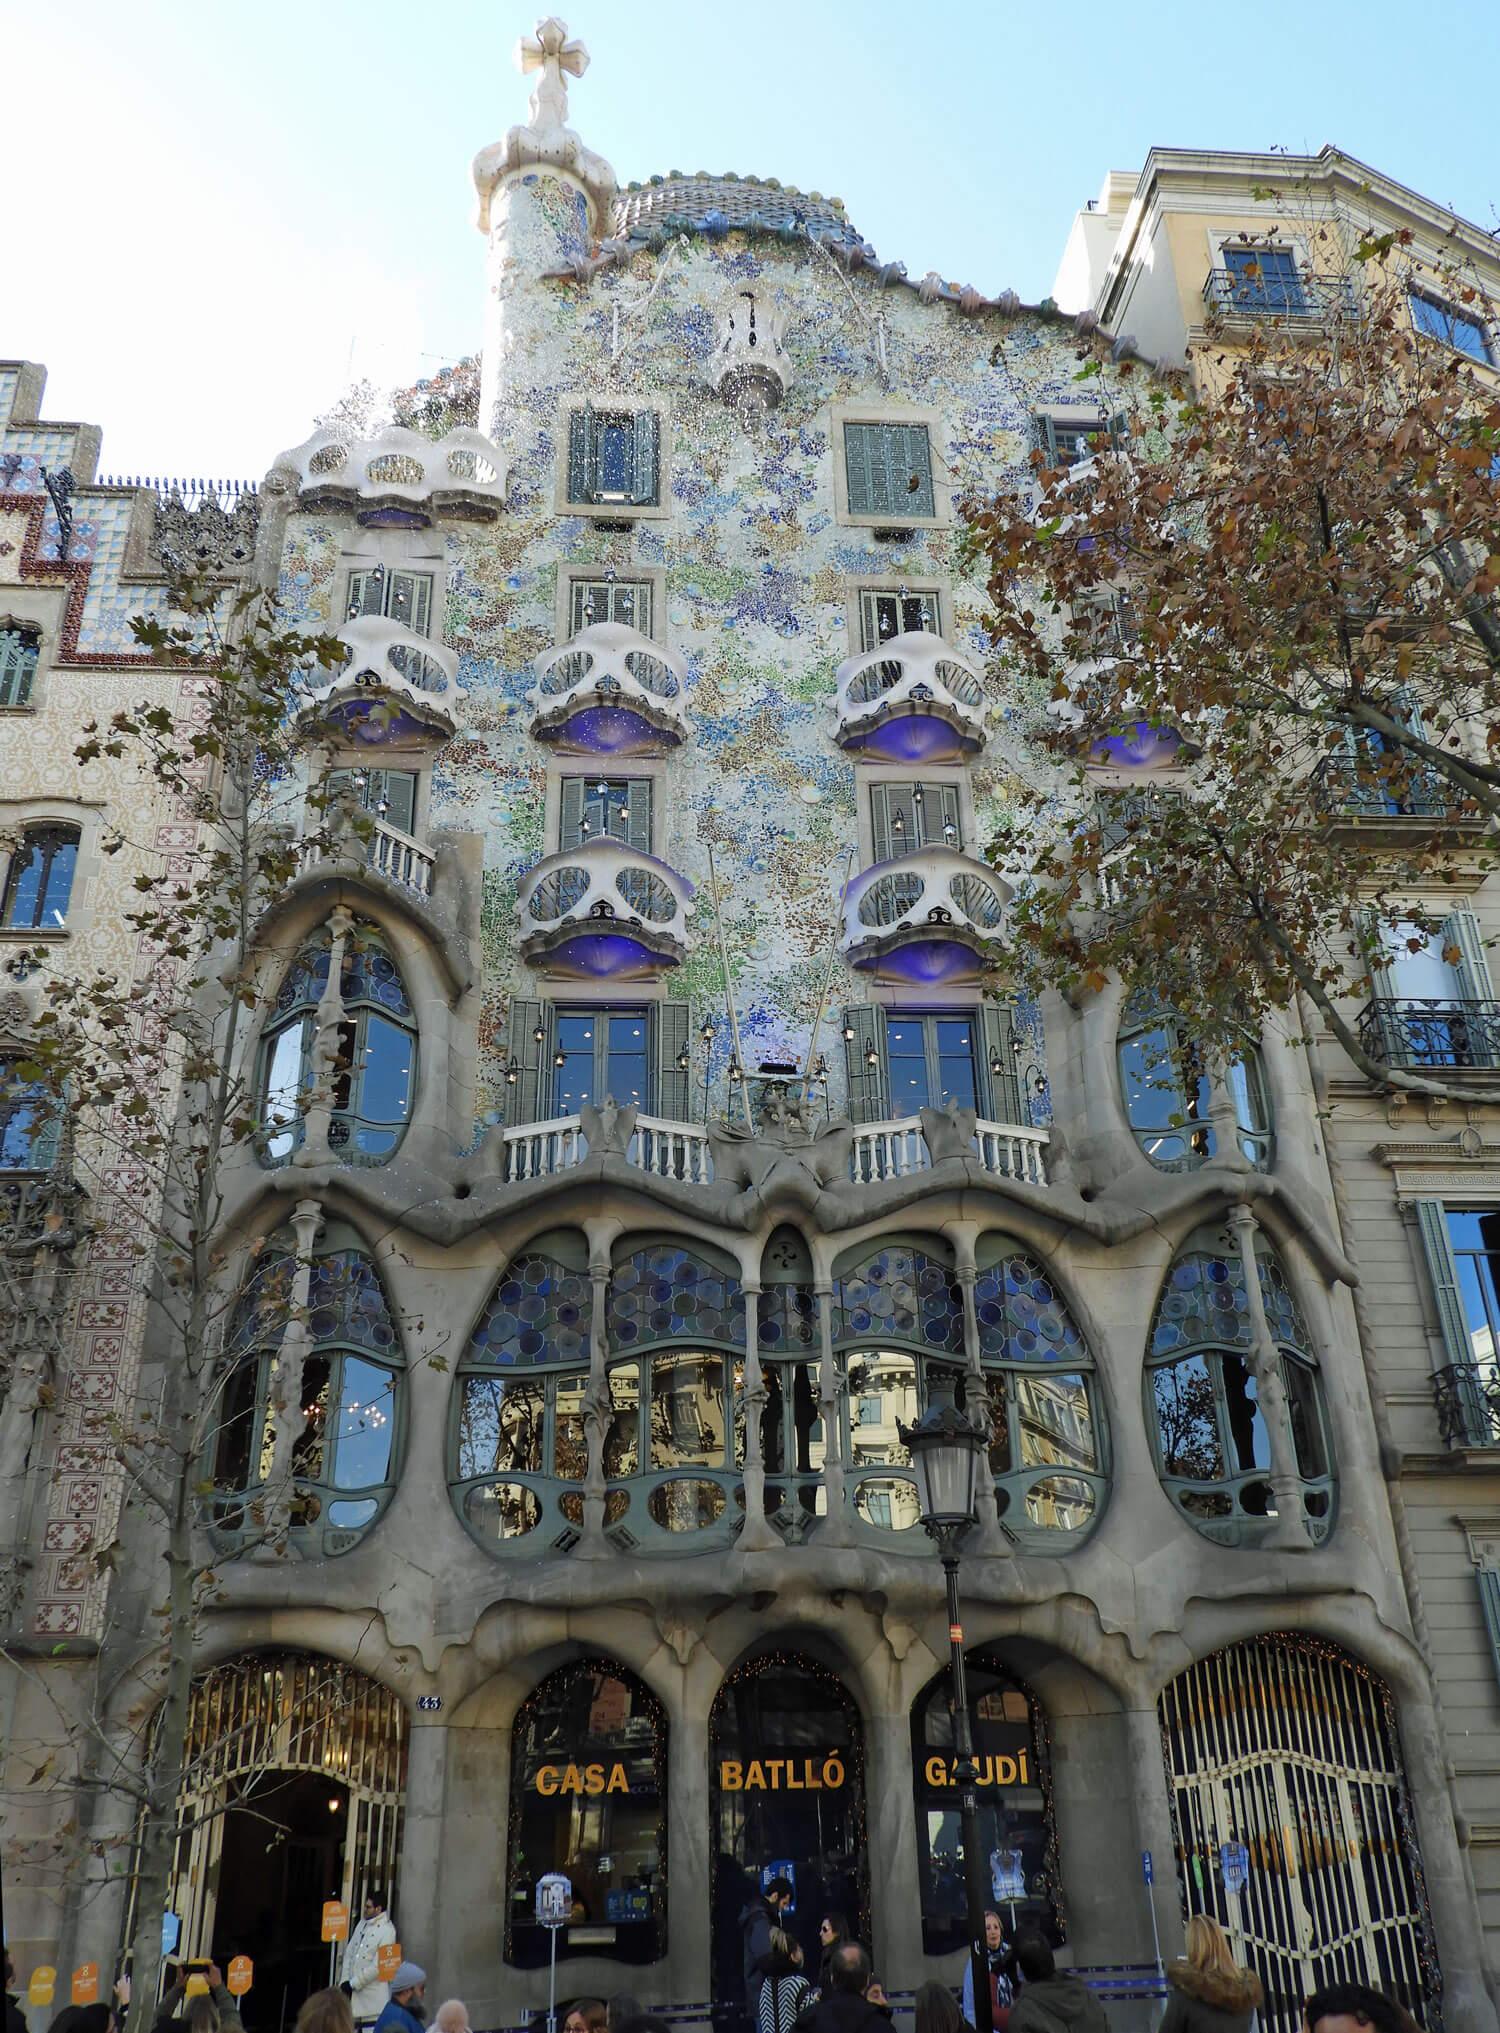 spain-barcelona-batllo-casa.jpg